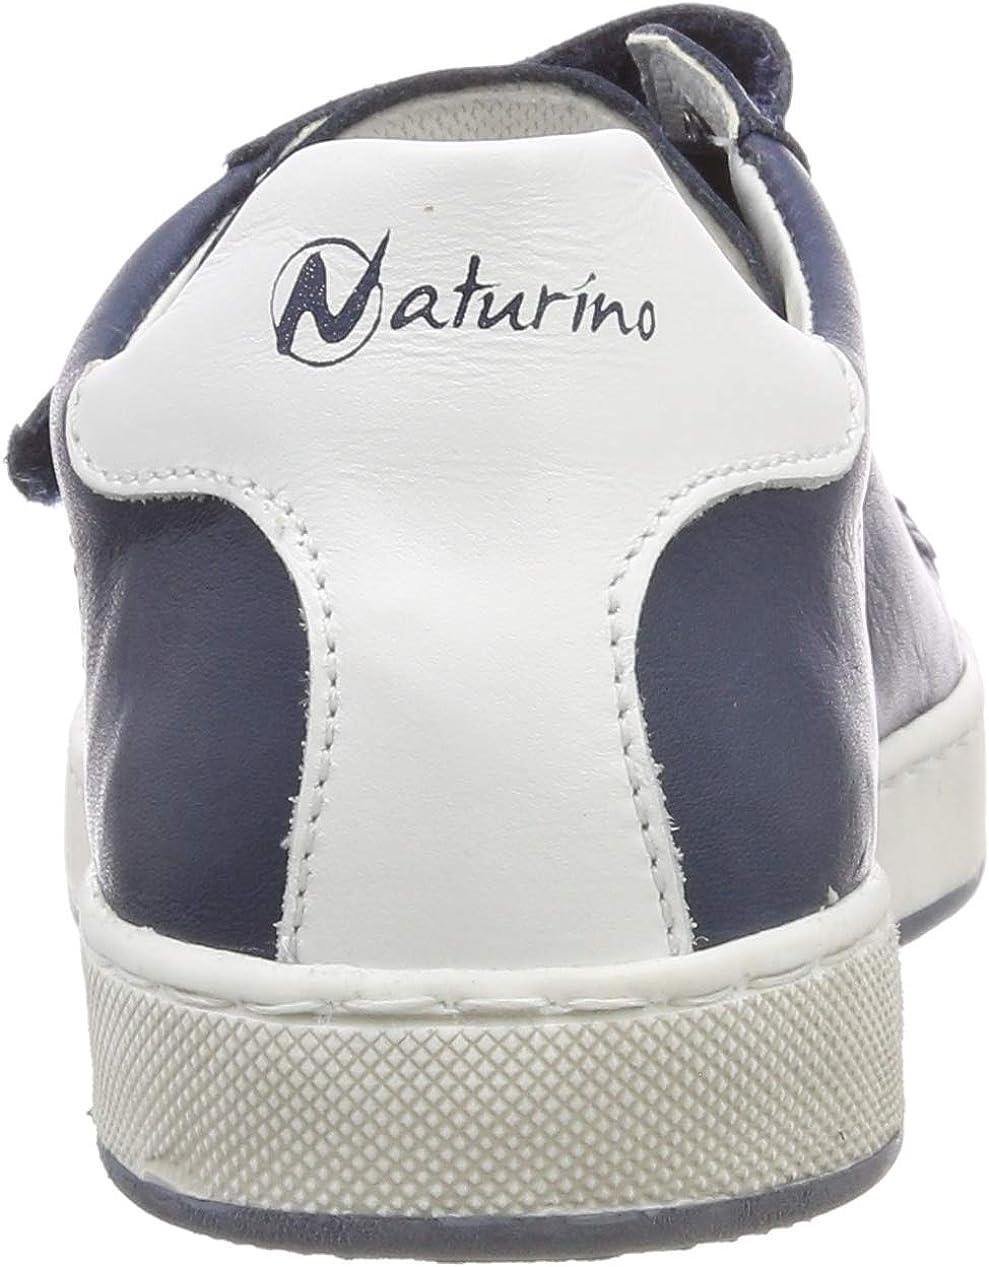 Naturino Boys Hasselt Vl Gymnastics Shoes